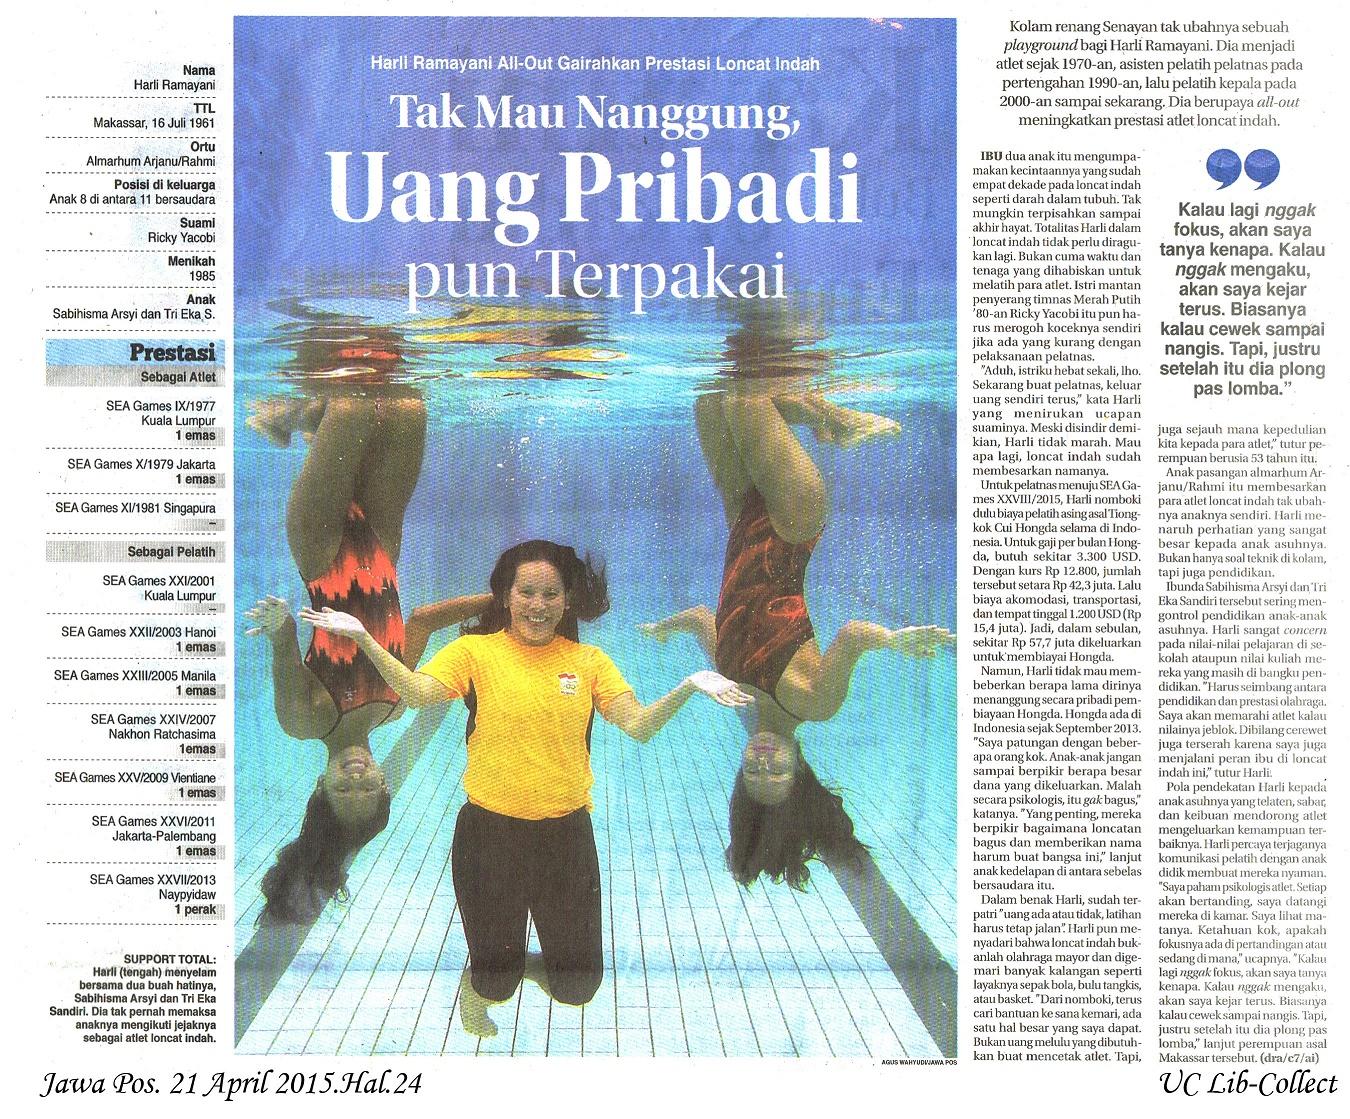 Harli Ramayani All Out Gairahkan Prestasi Loncat Indah. Jawa Pos. 21 April 2015.Hal.24